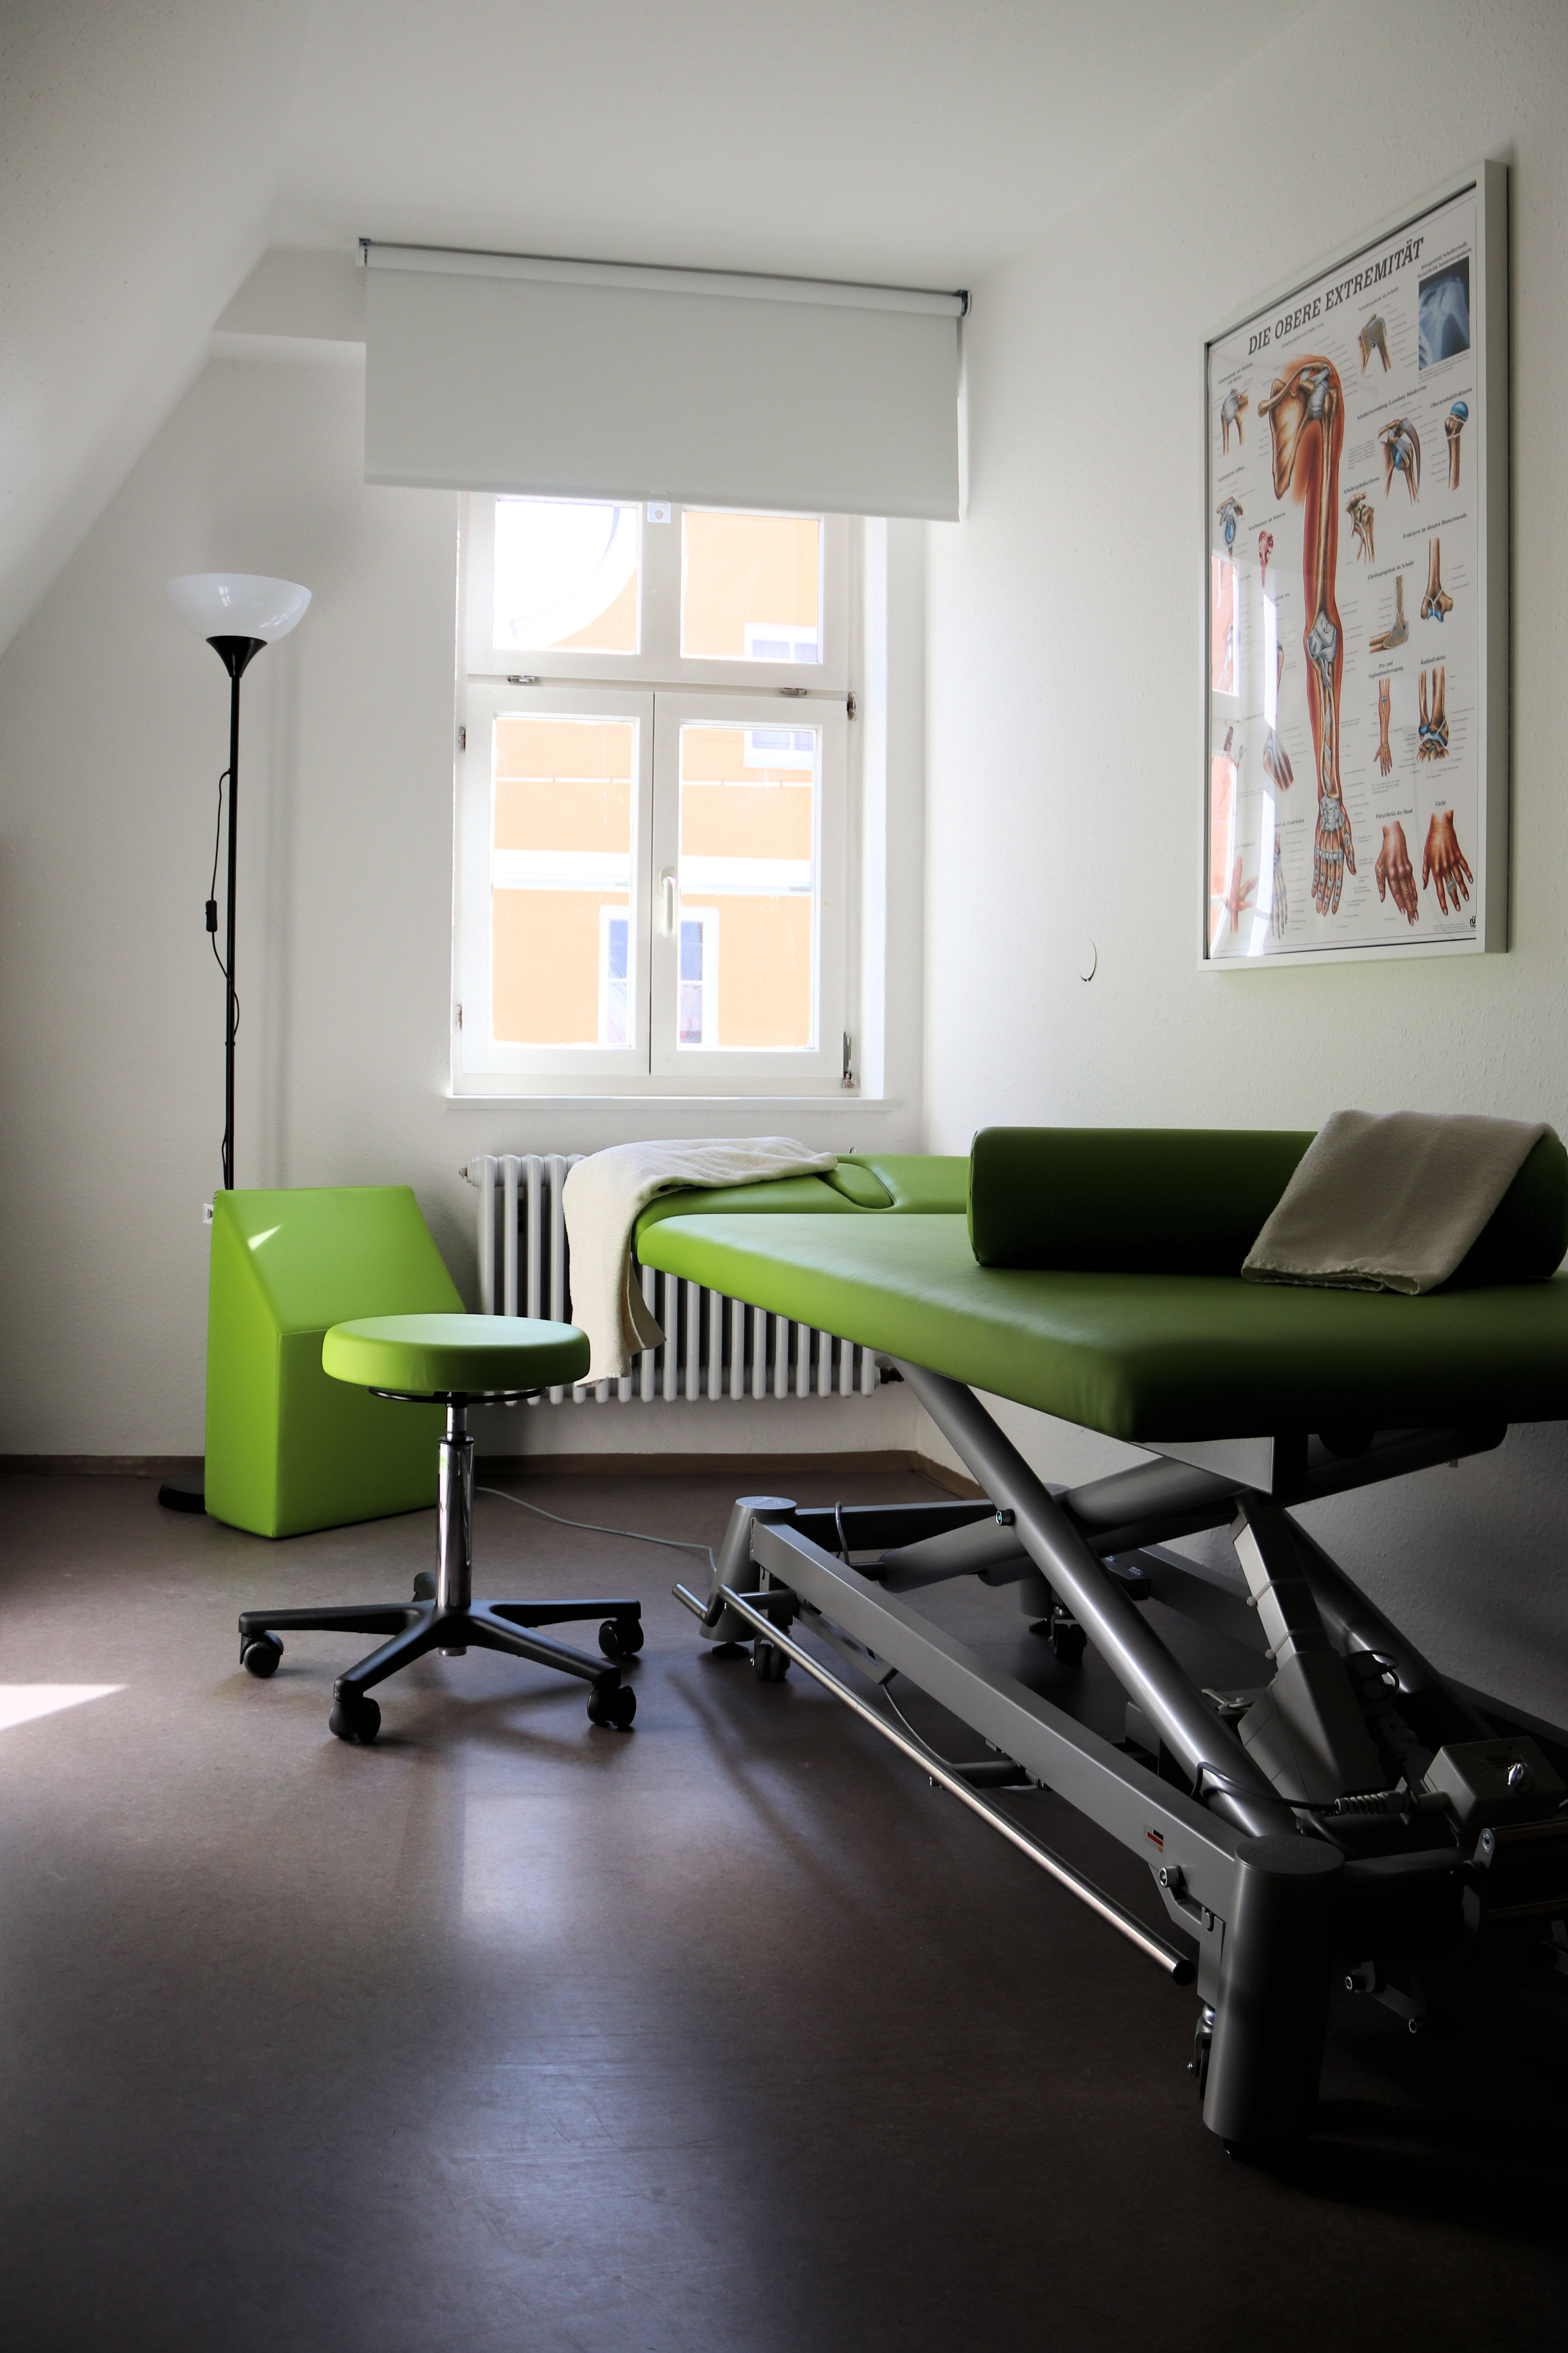 Physio Kolb & Wolff, Krankengymnastik Wolff